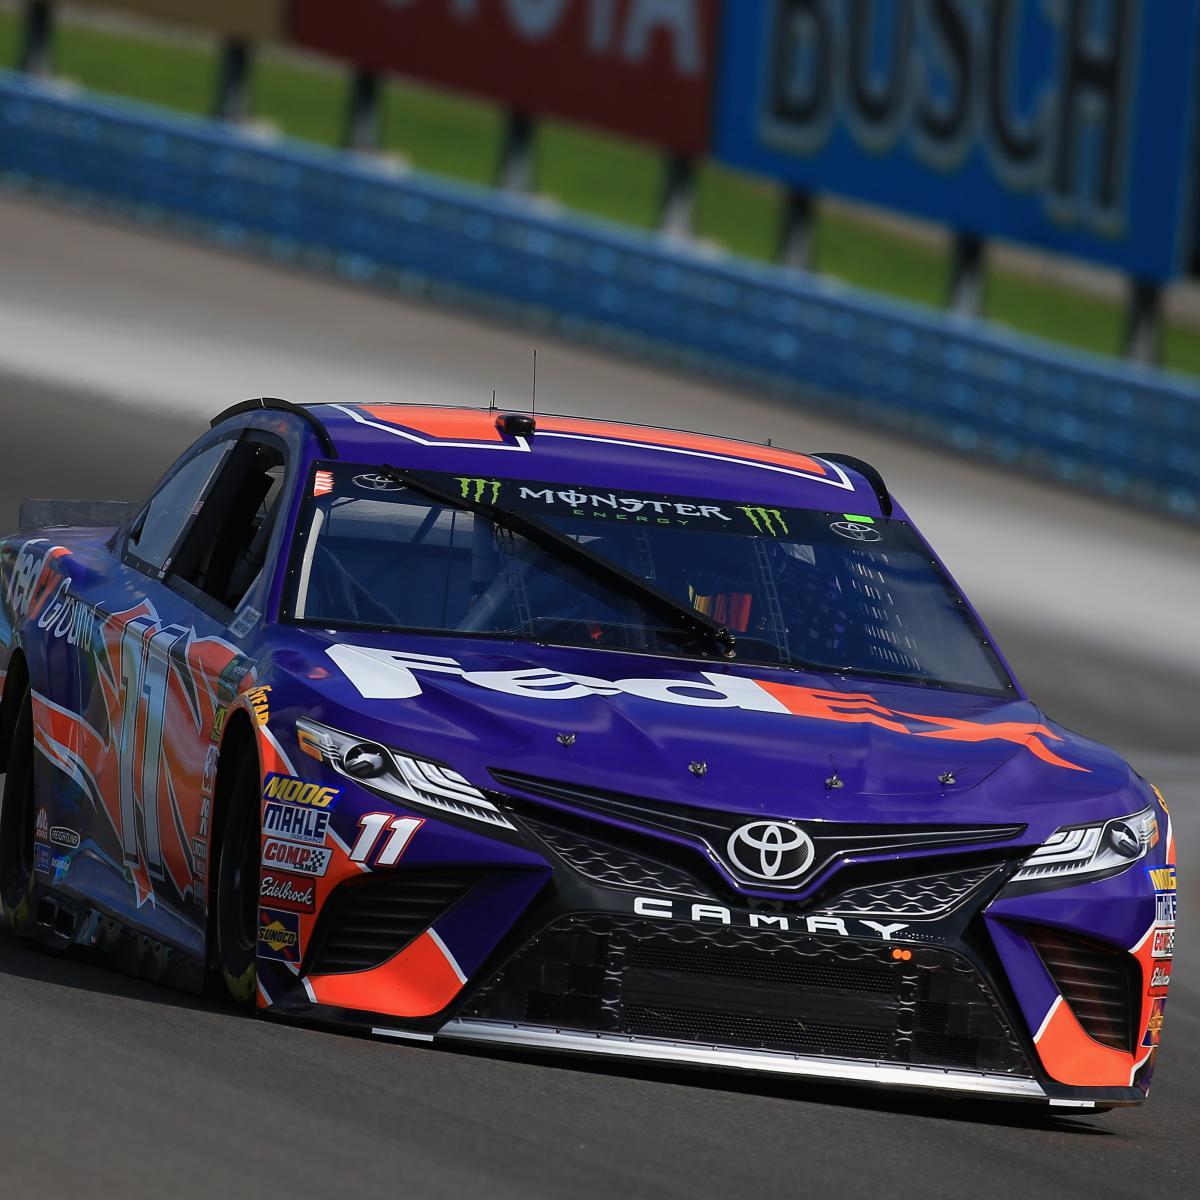 NASCAR at Watkins Glen 2018 Qualifying Results: Denny Hamlin Takes Pole